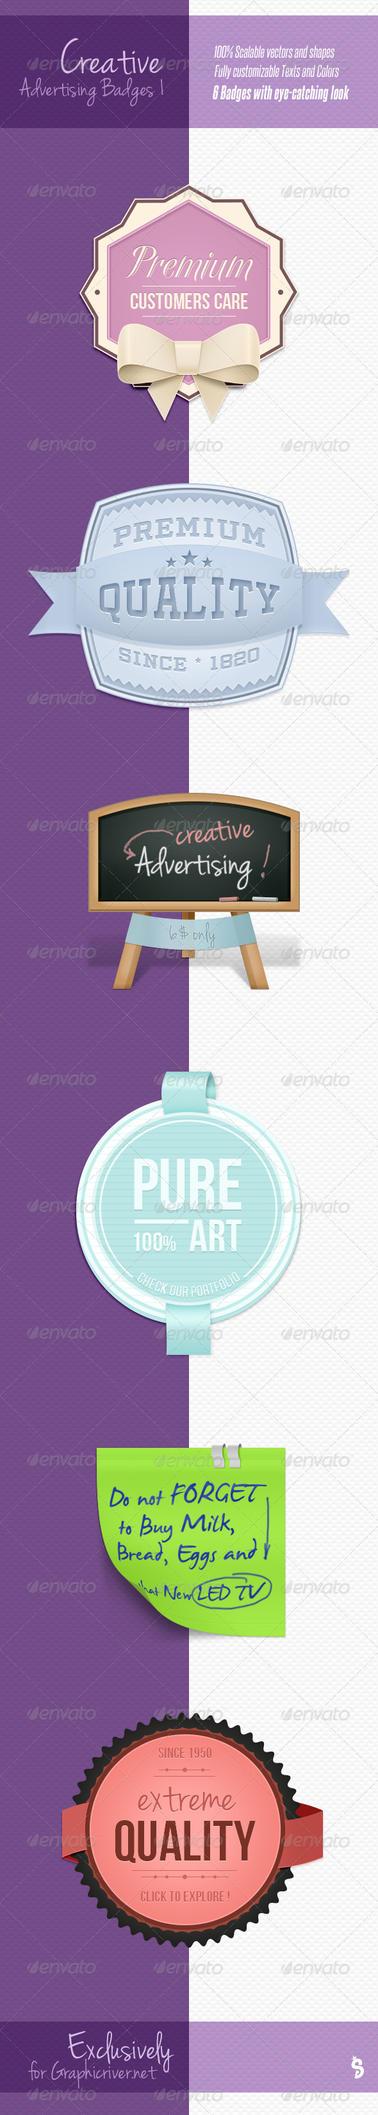 Creative Web Badges 1 by survivorcz